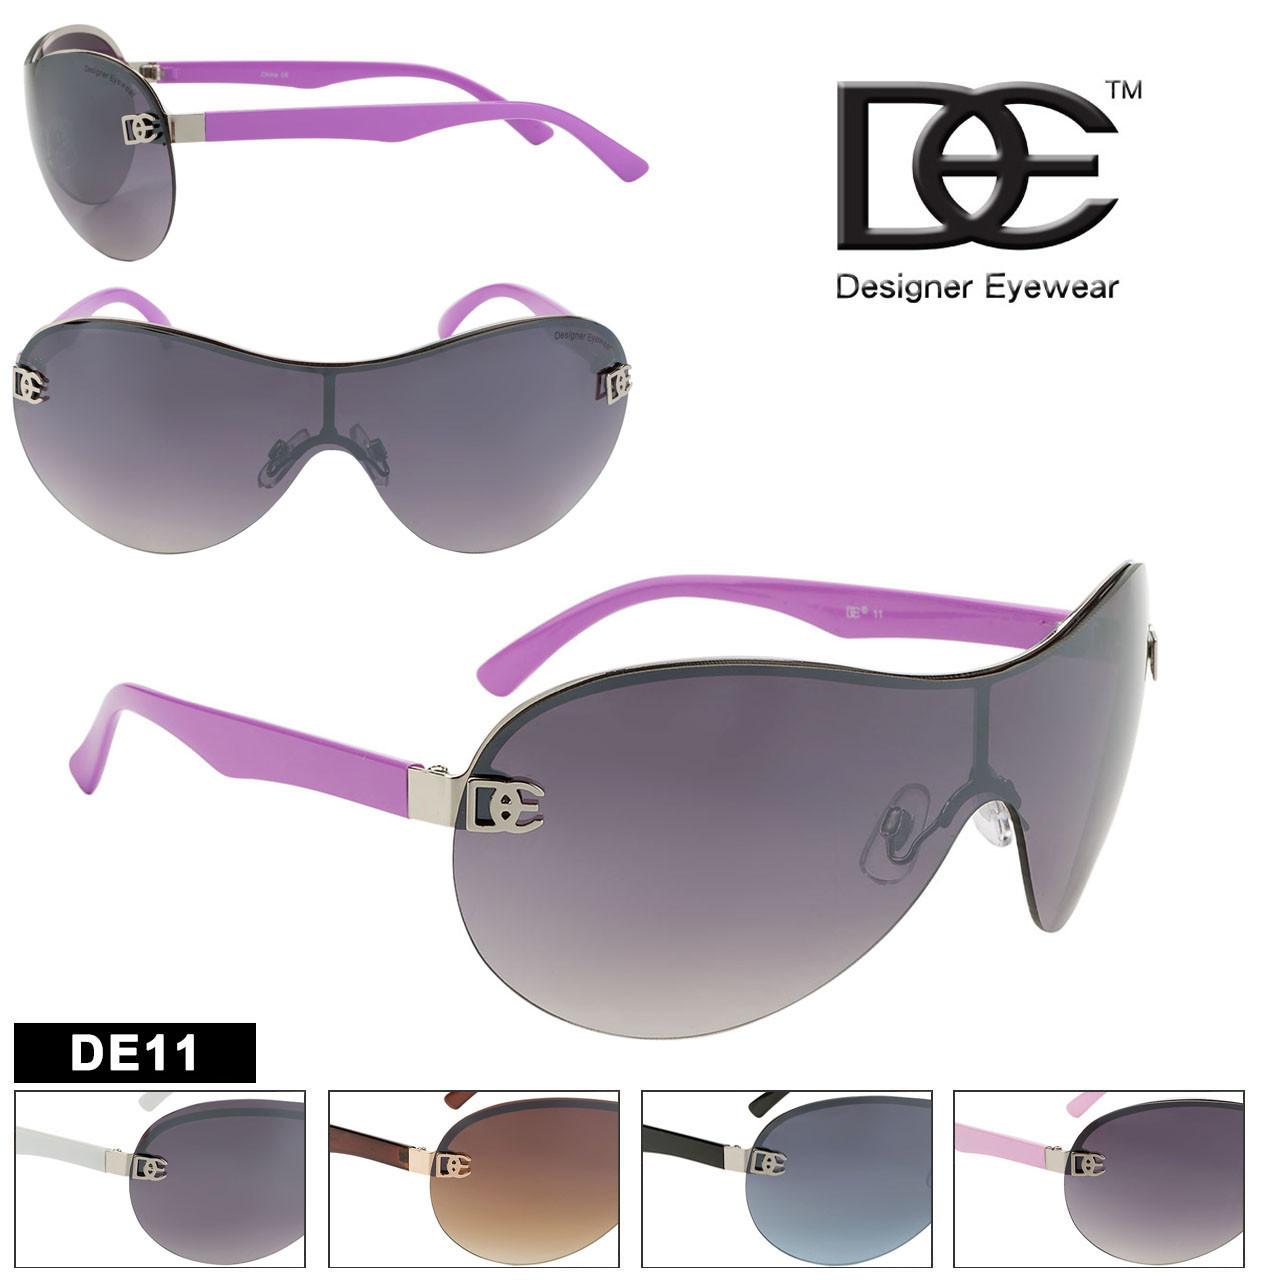 DE™ Designer Eyewear Sunglasses ~ Style #DE11